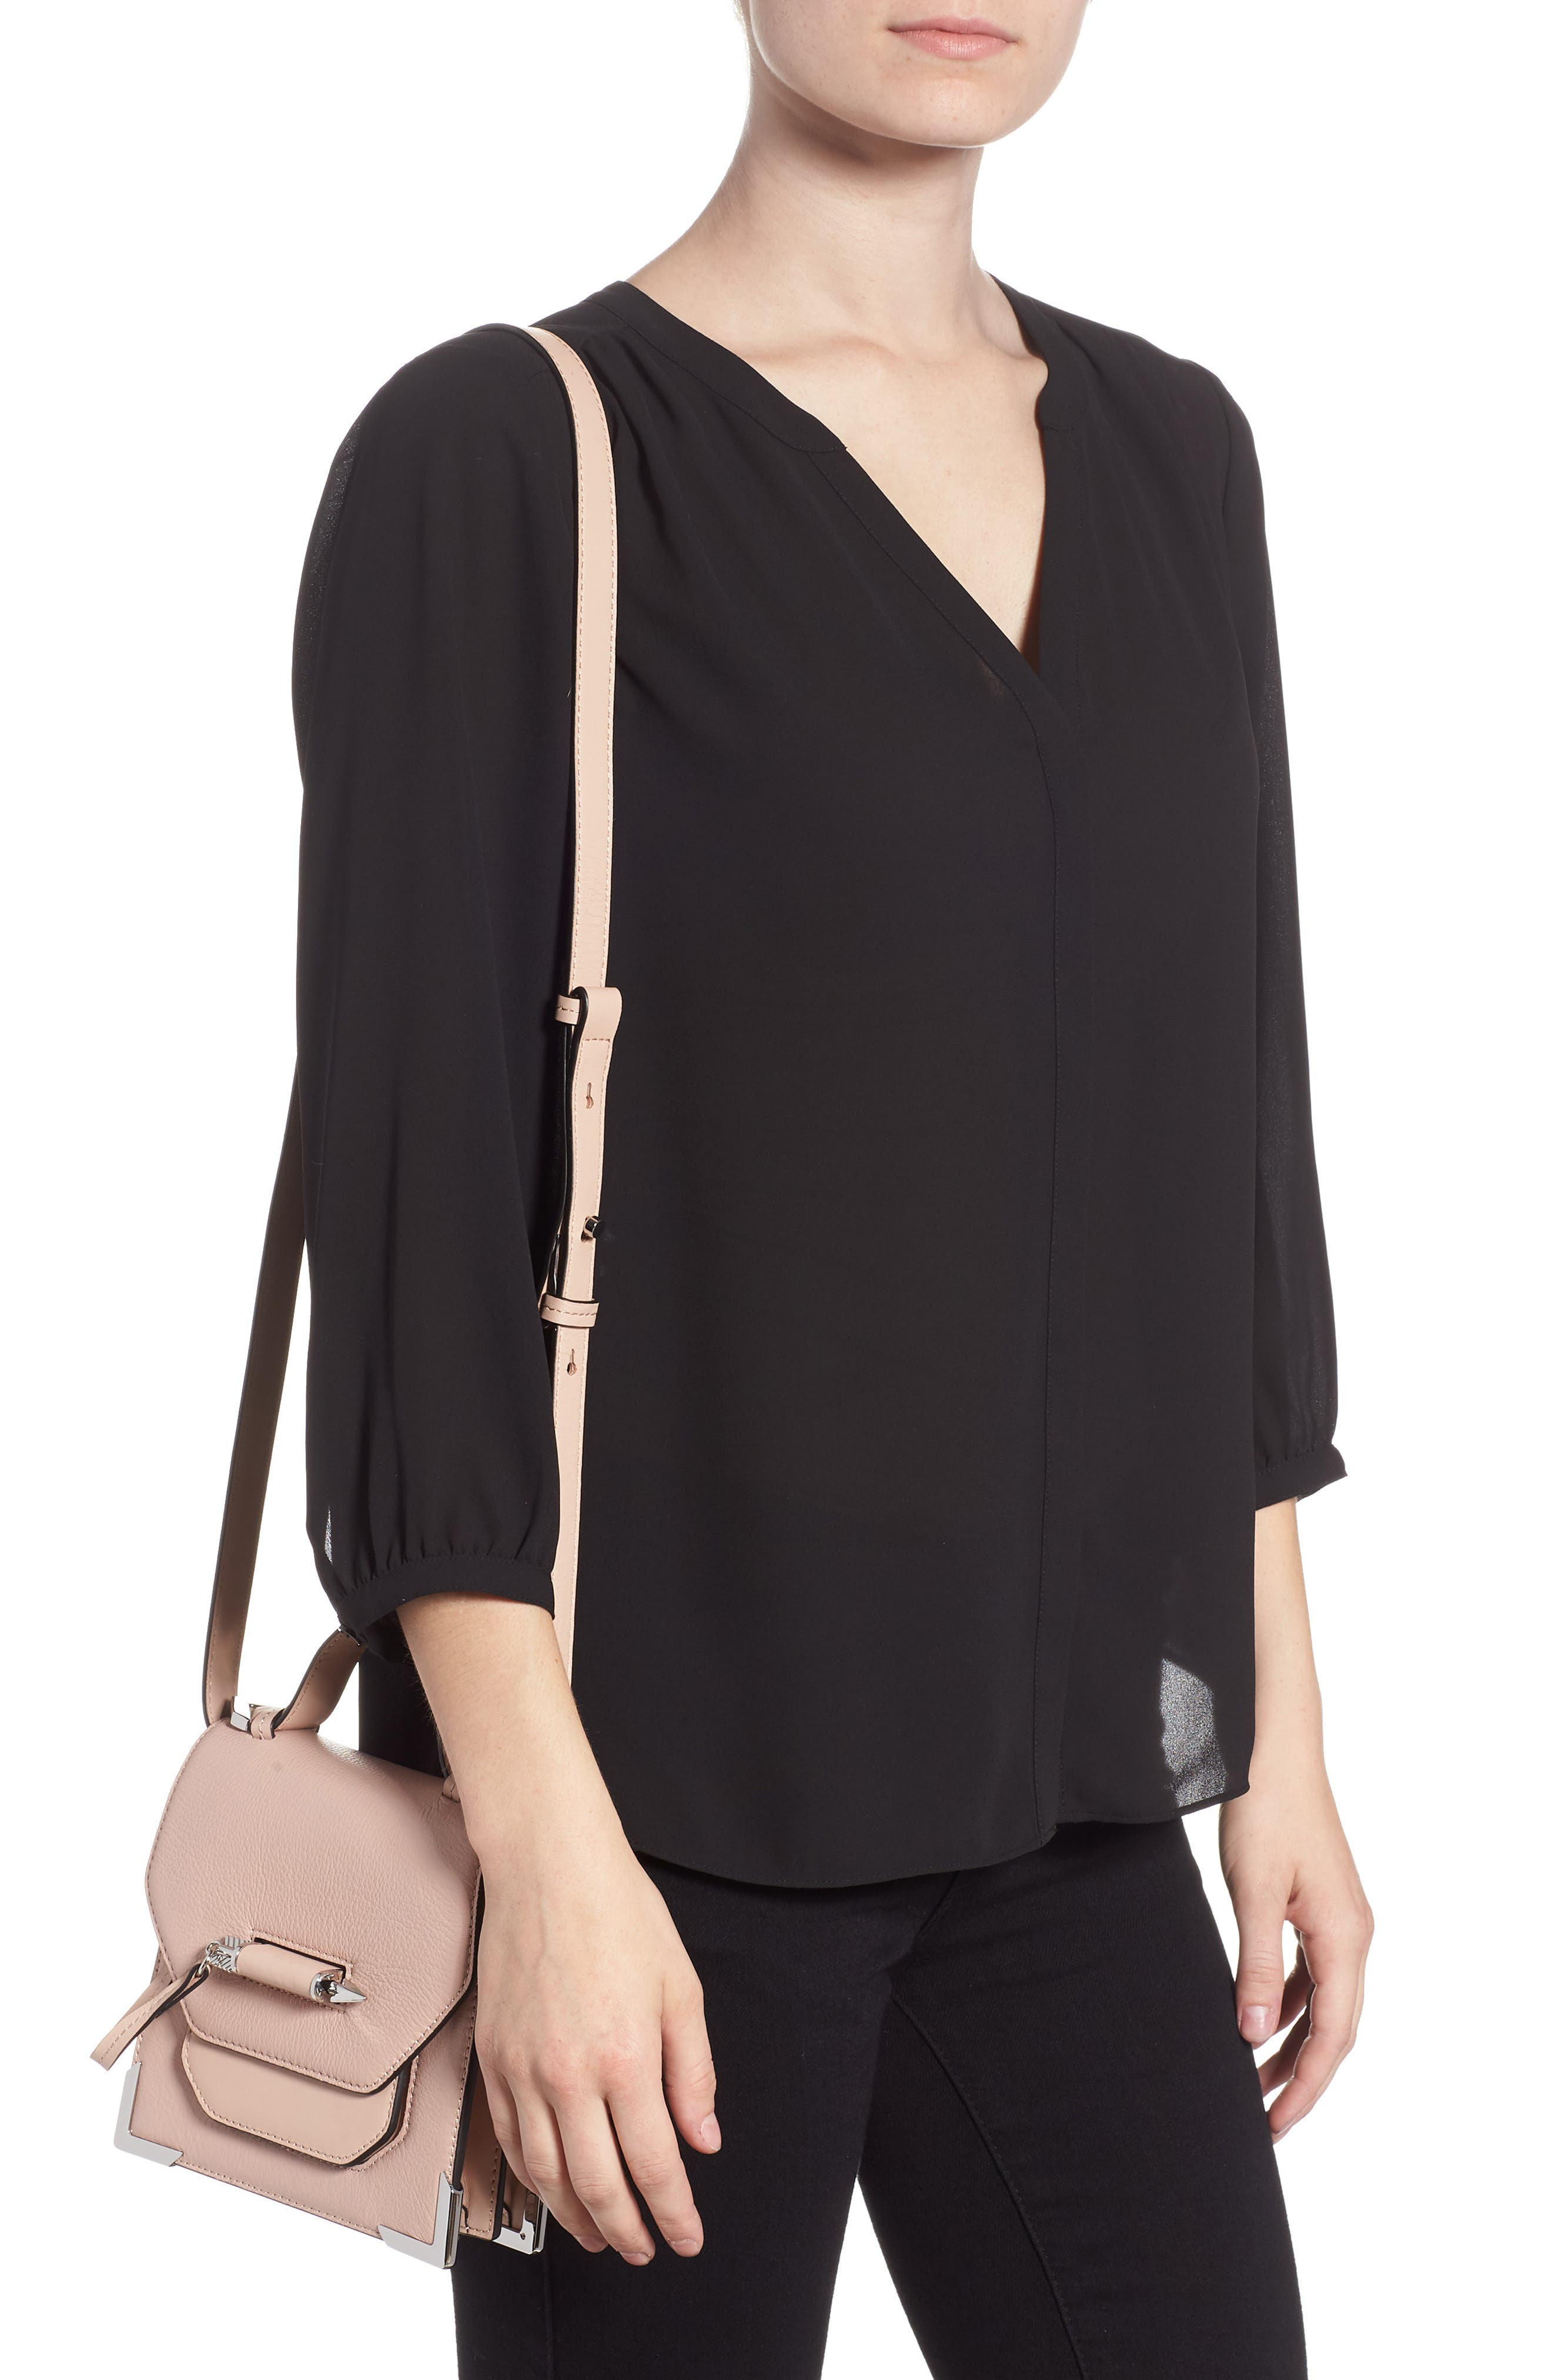 Mini Rubie Leather Shoulder Bag,                             Alternate thumbnail 2, color,                             PETAL/ GUNMETAL